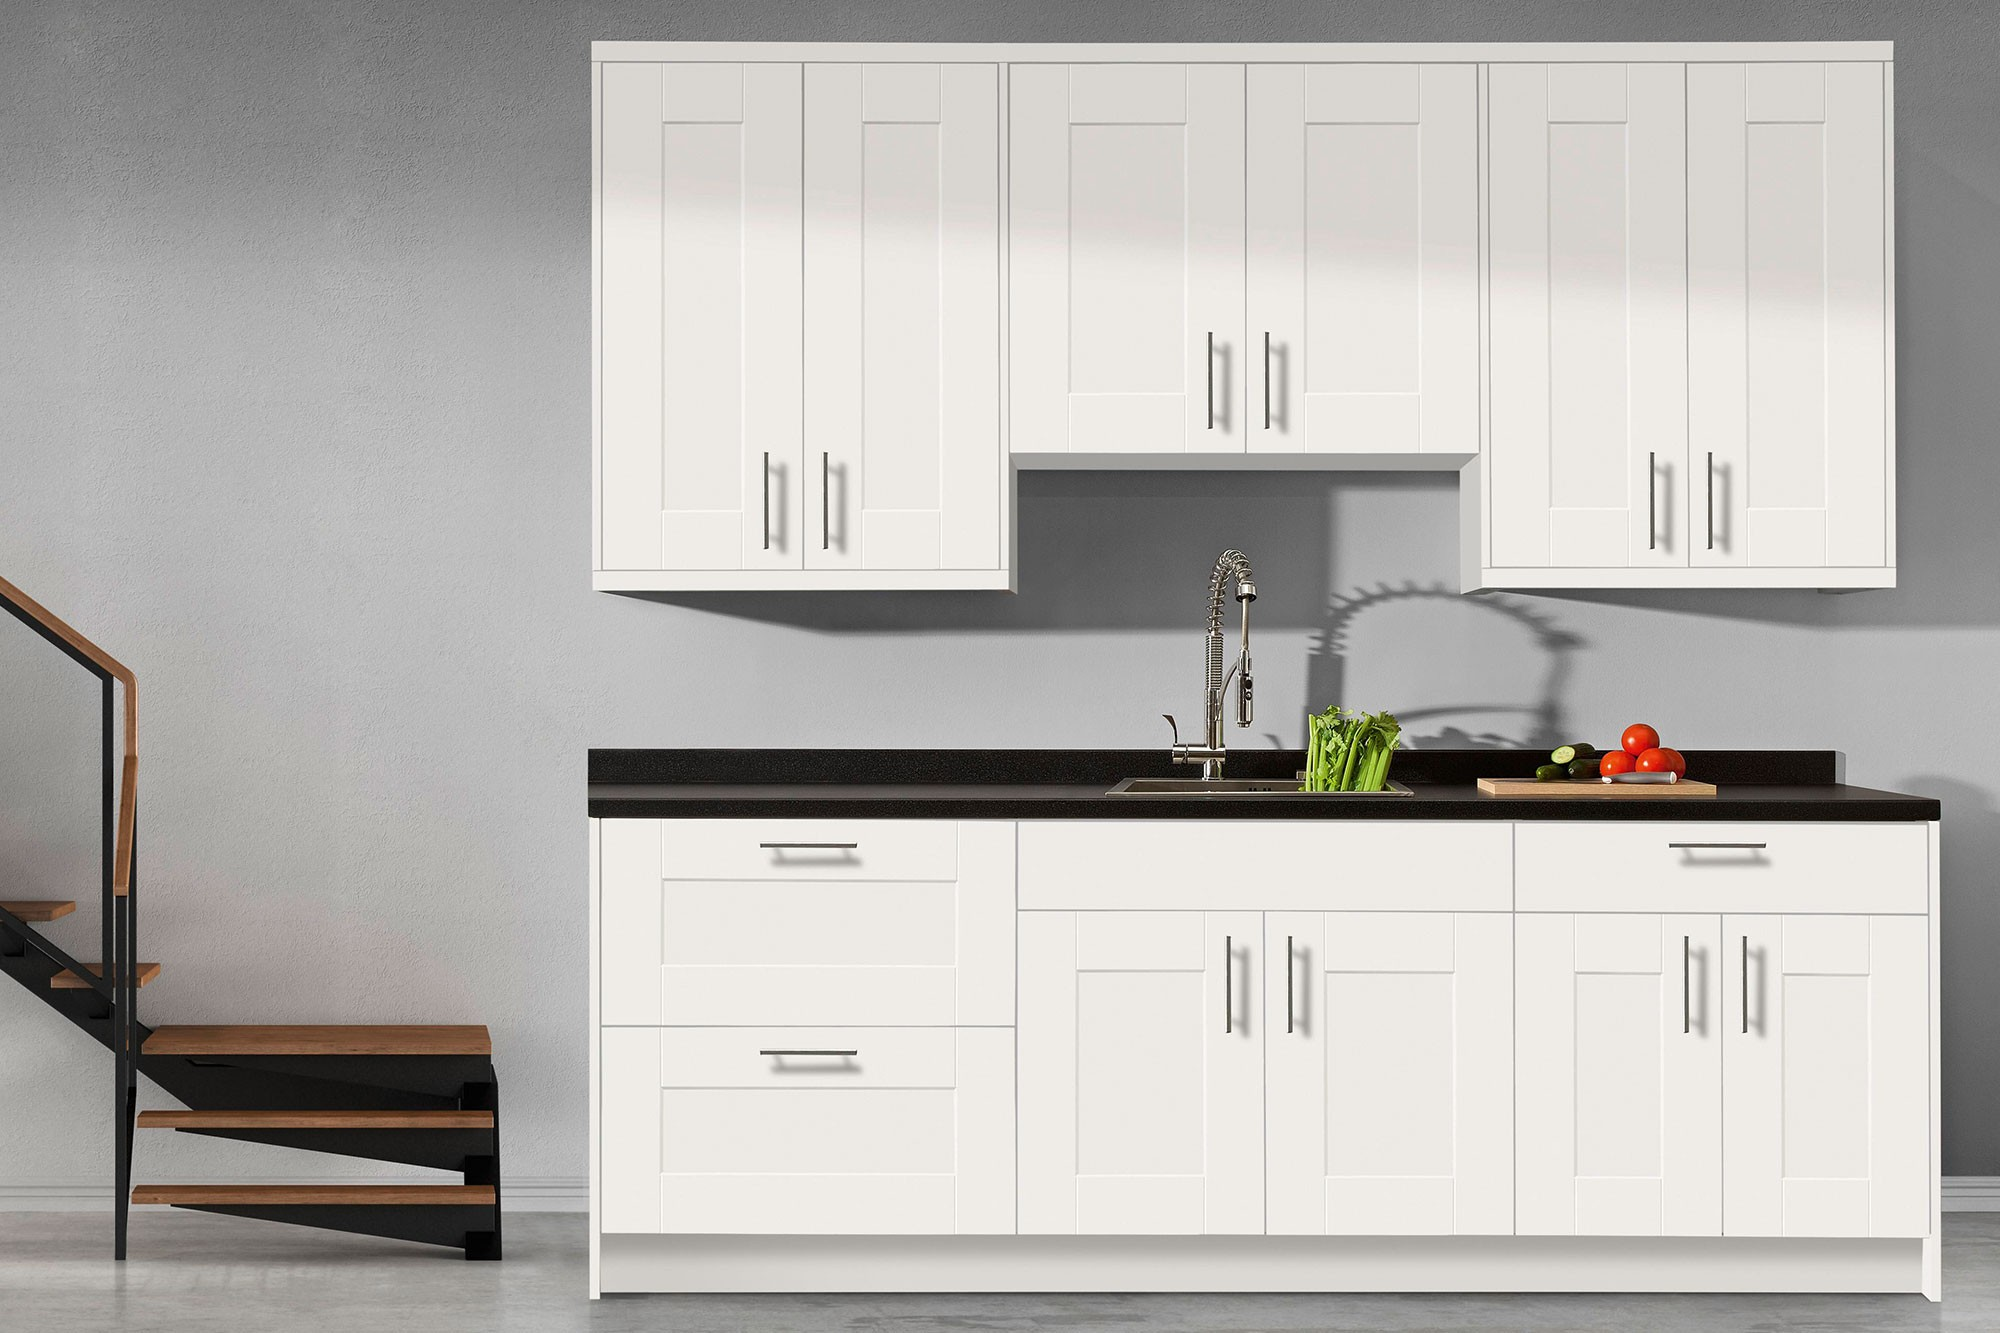 stock kitchen cabinets stock kitchen cabinets bianca white shaker kitchen cabinets in stock